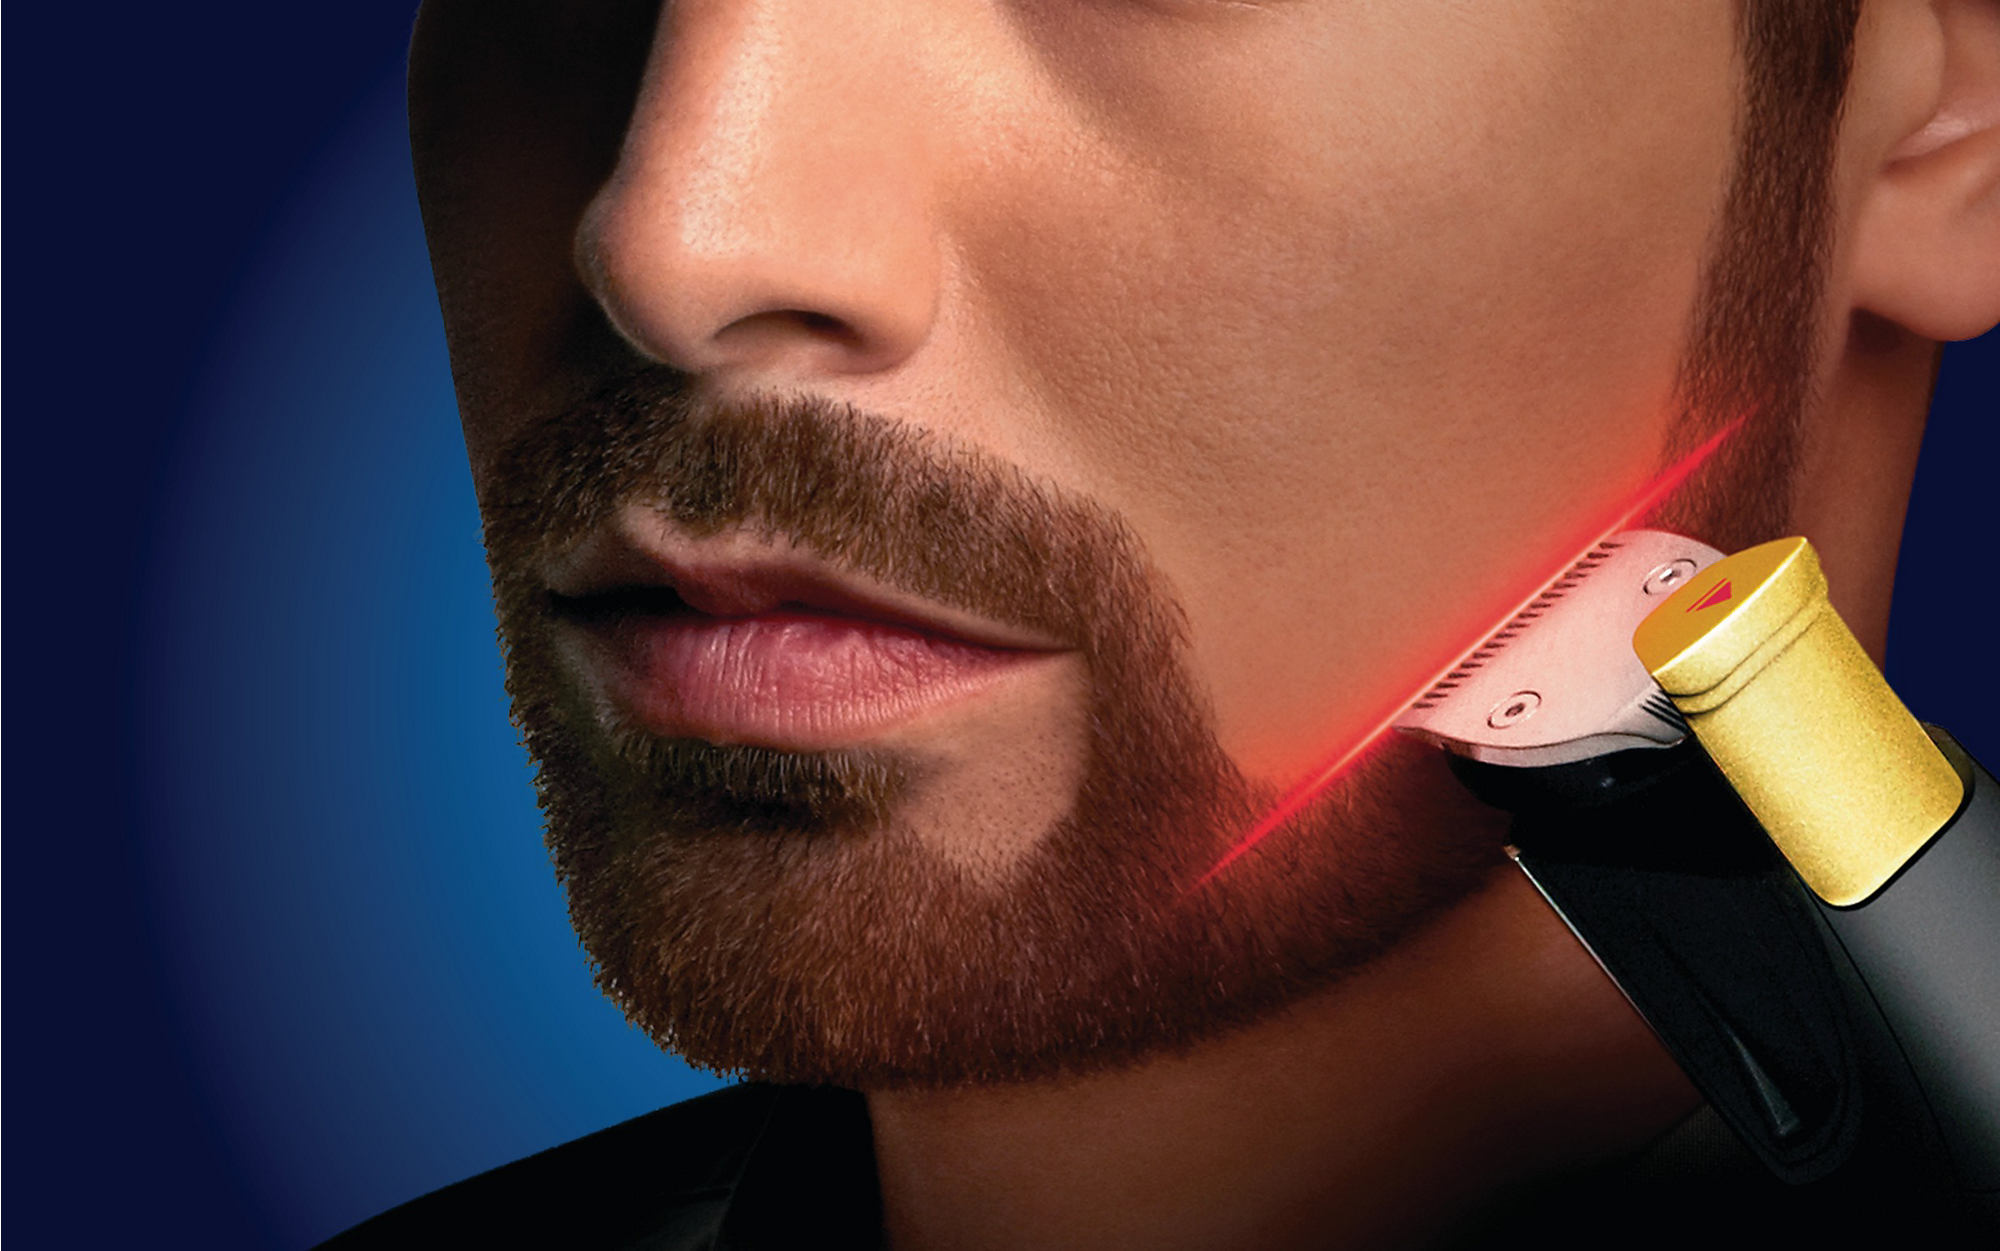 laser beard trimmer